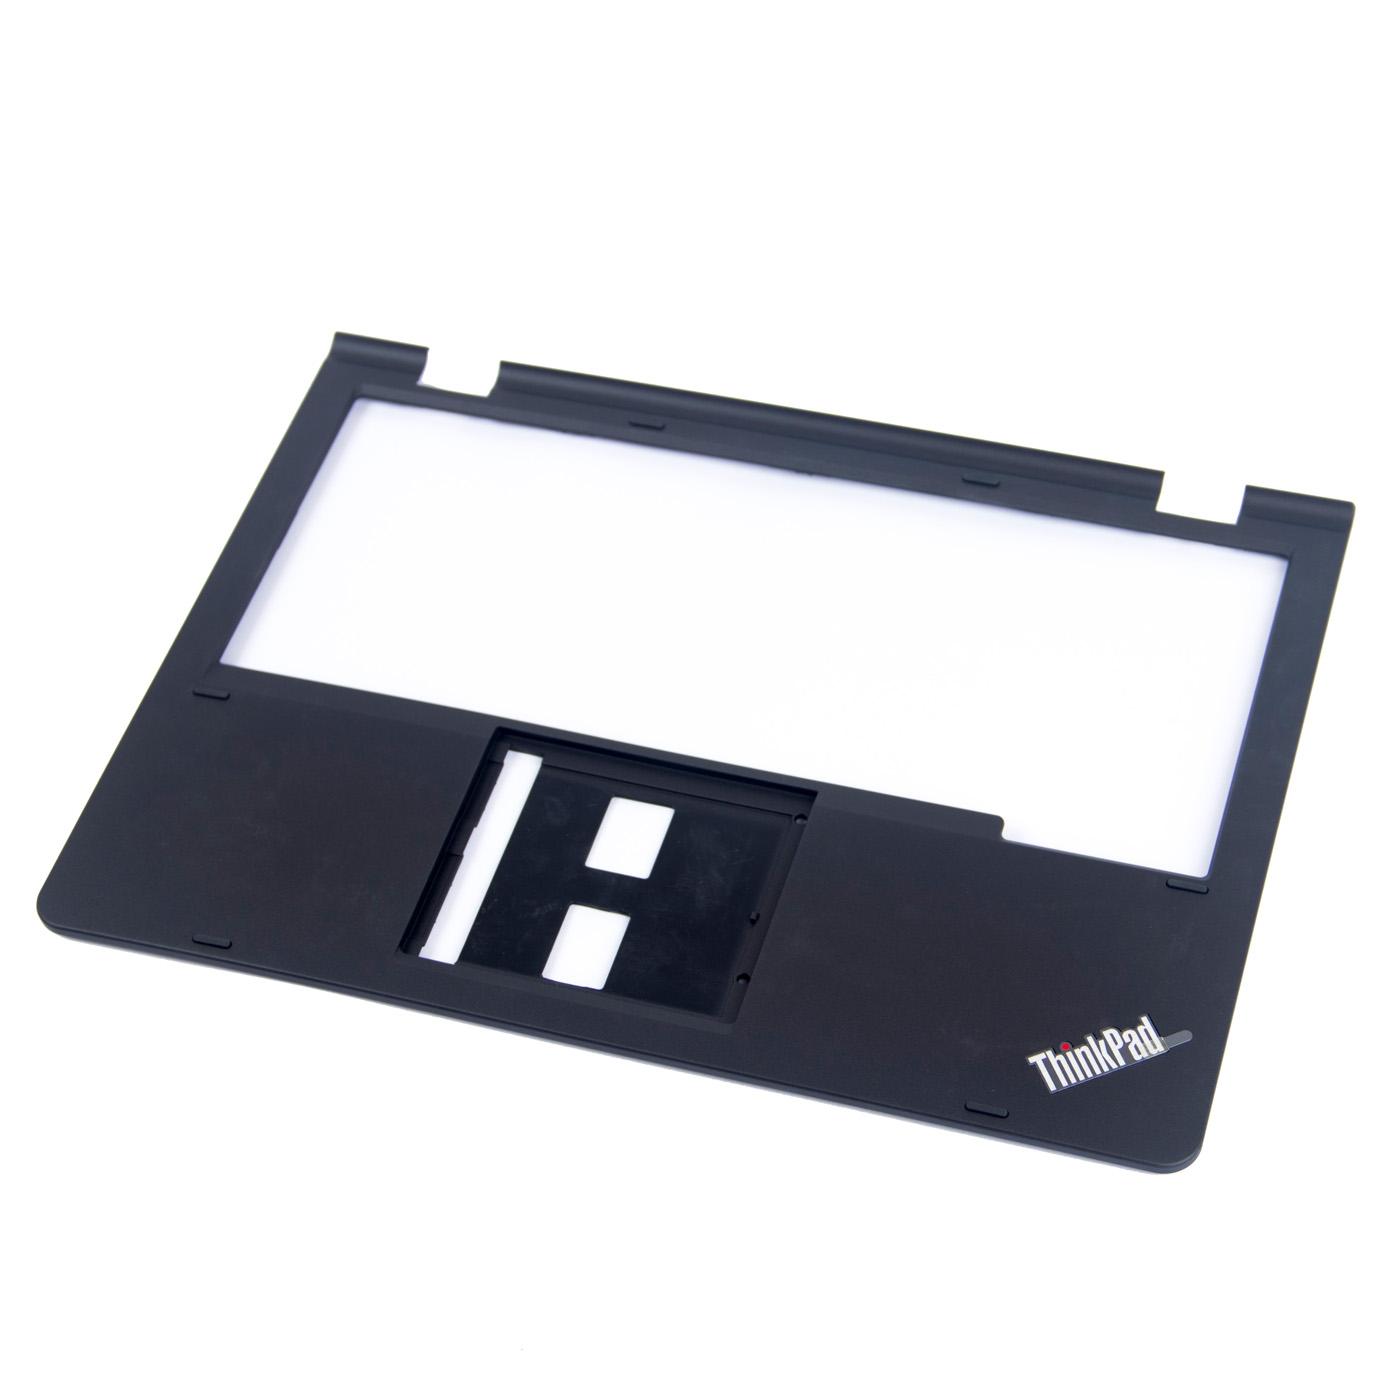 Palmrest Lenovo ThinkPad X1 Helix 20CG 20CH 00JT556 :: ABCDEAL PL